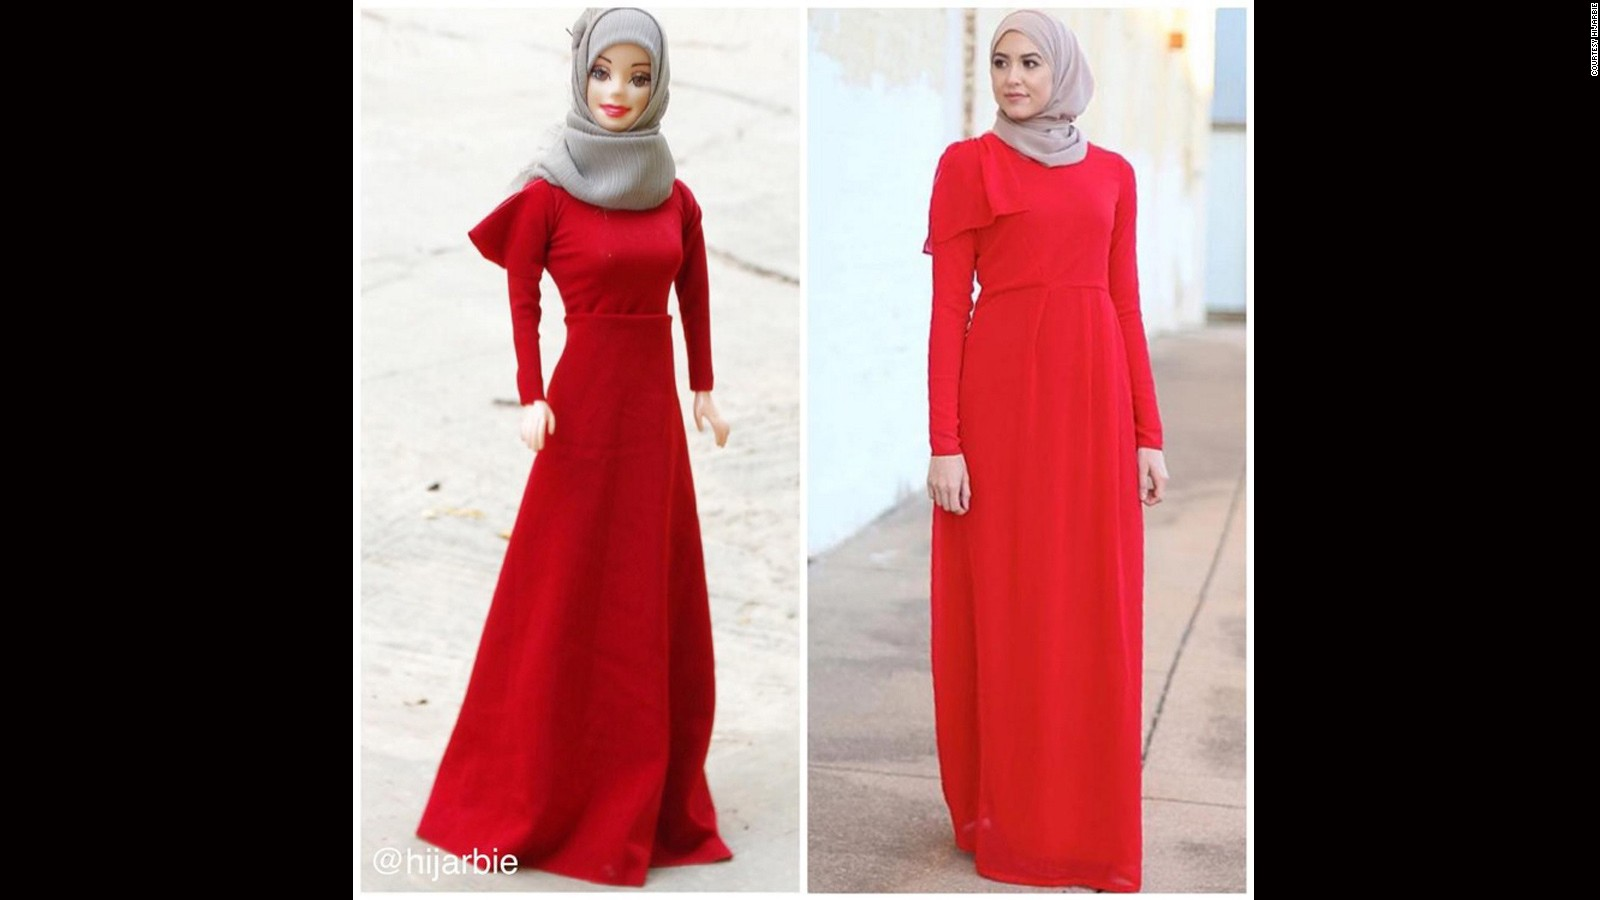 Hijarbie How Barbie Got A Muslim Makeover Cnn Style Boneka